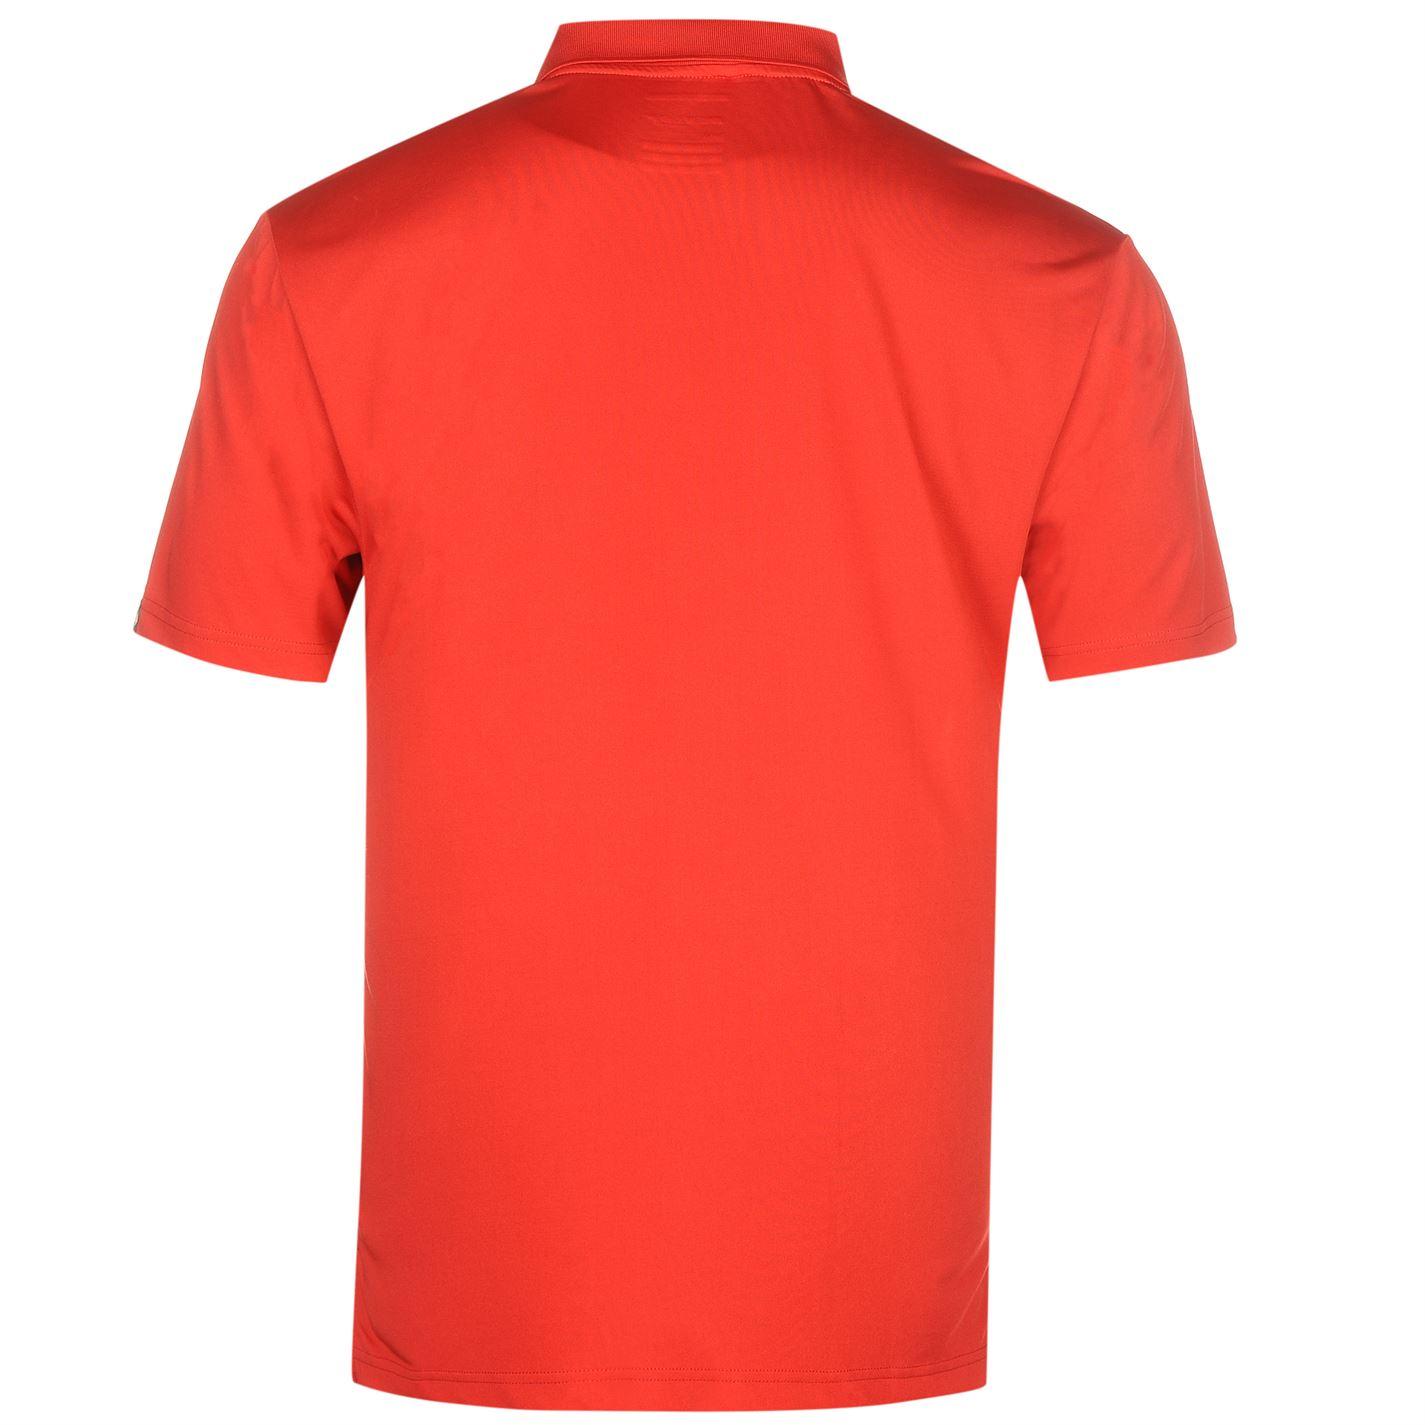 Camiseta Dunlop Rojo Atras